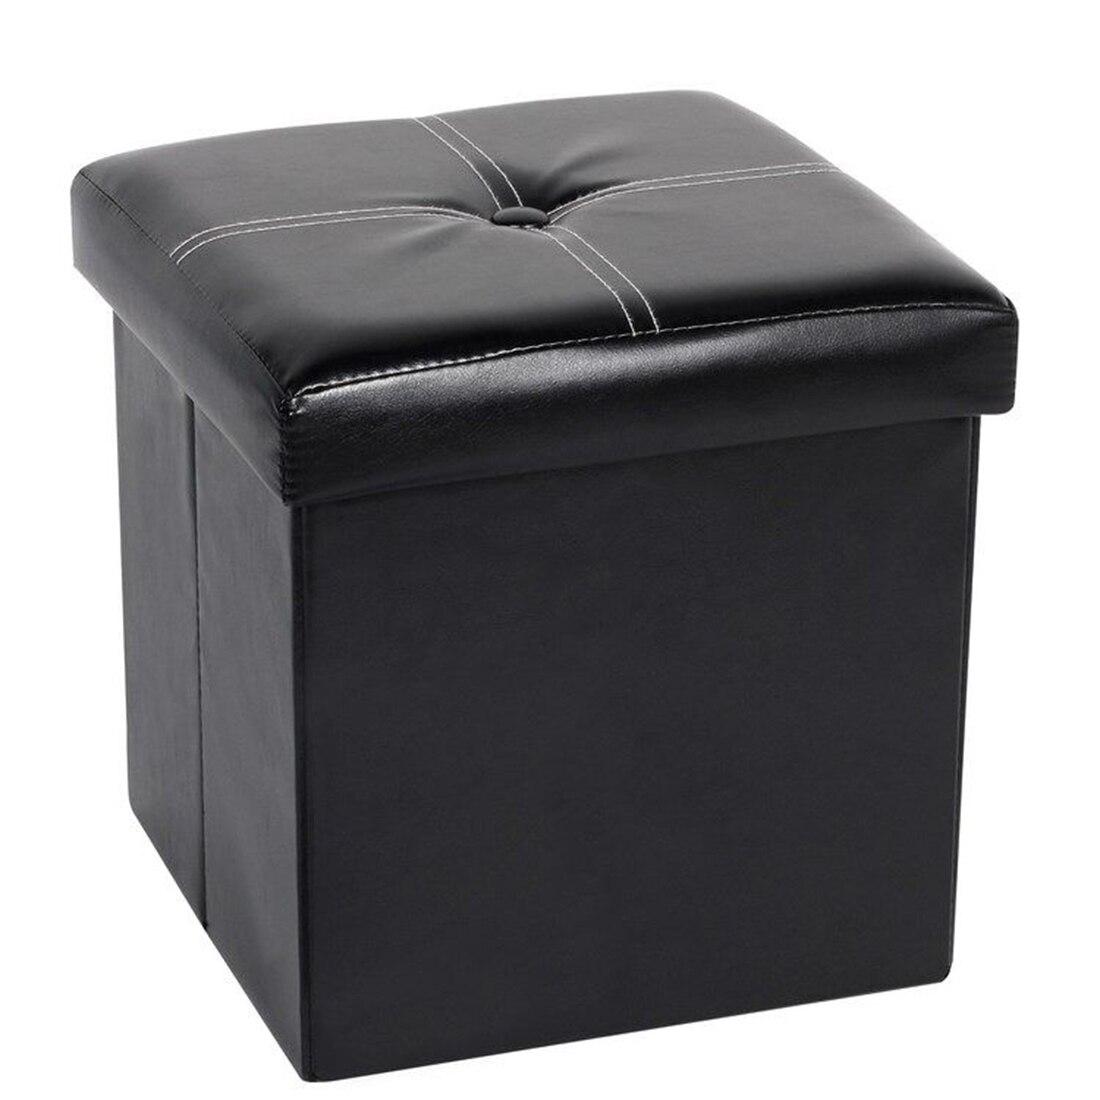 30CM New Fashion Folding Storage Stool Household Decorative Sunderies PU Storage Footstool Storage Box Container Organizer